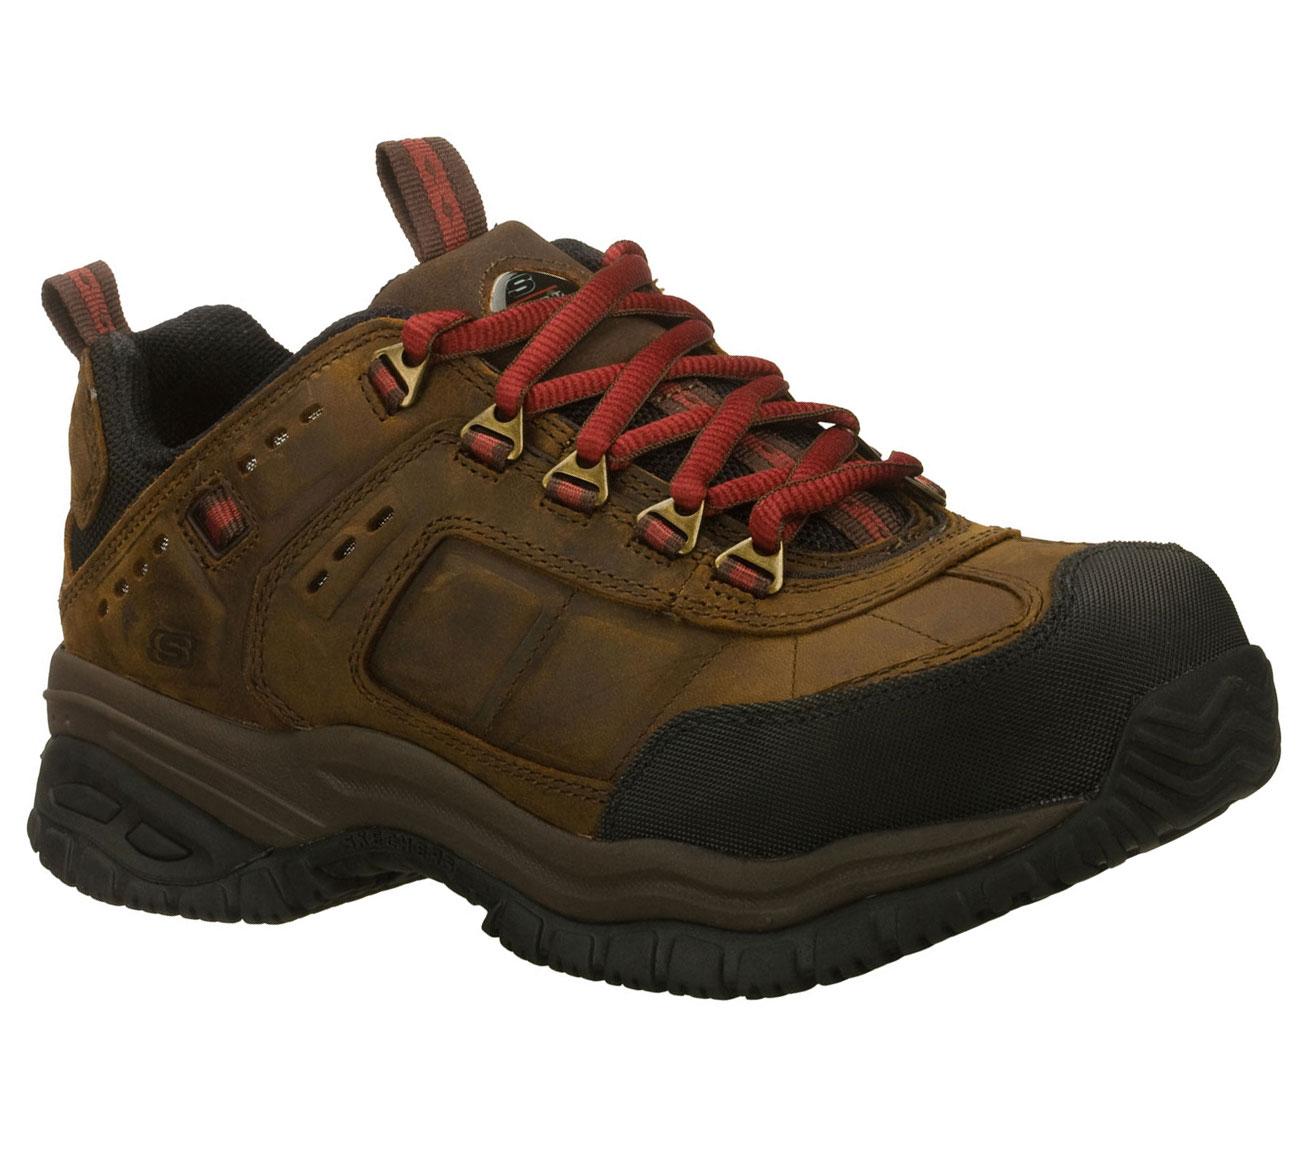 Skechers Men S Work Soft Stride Constructor Shoes